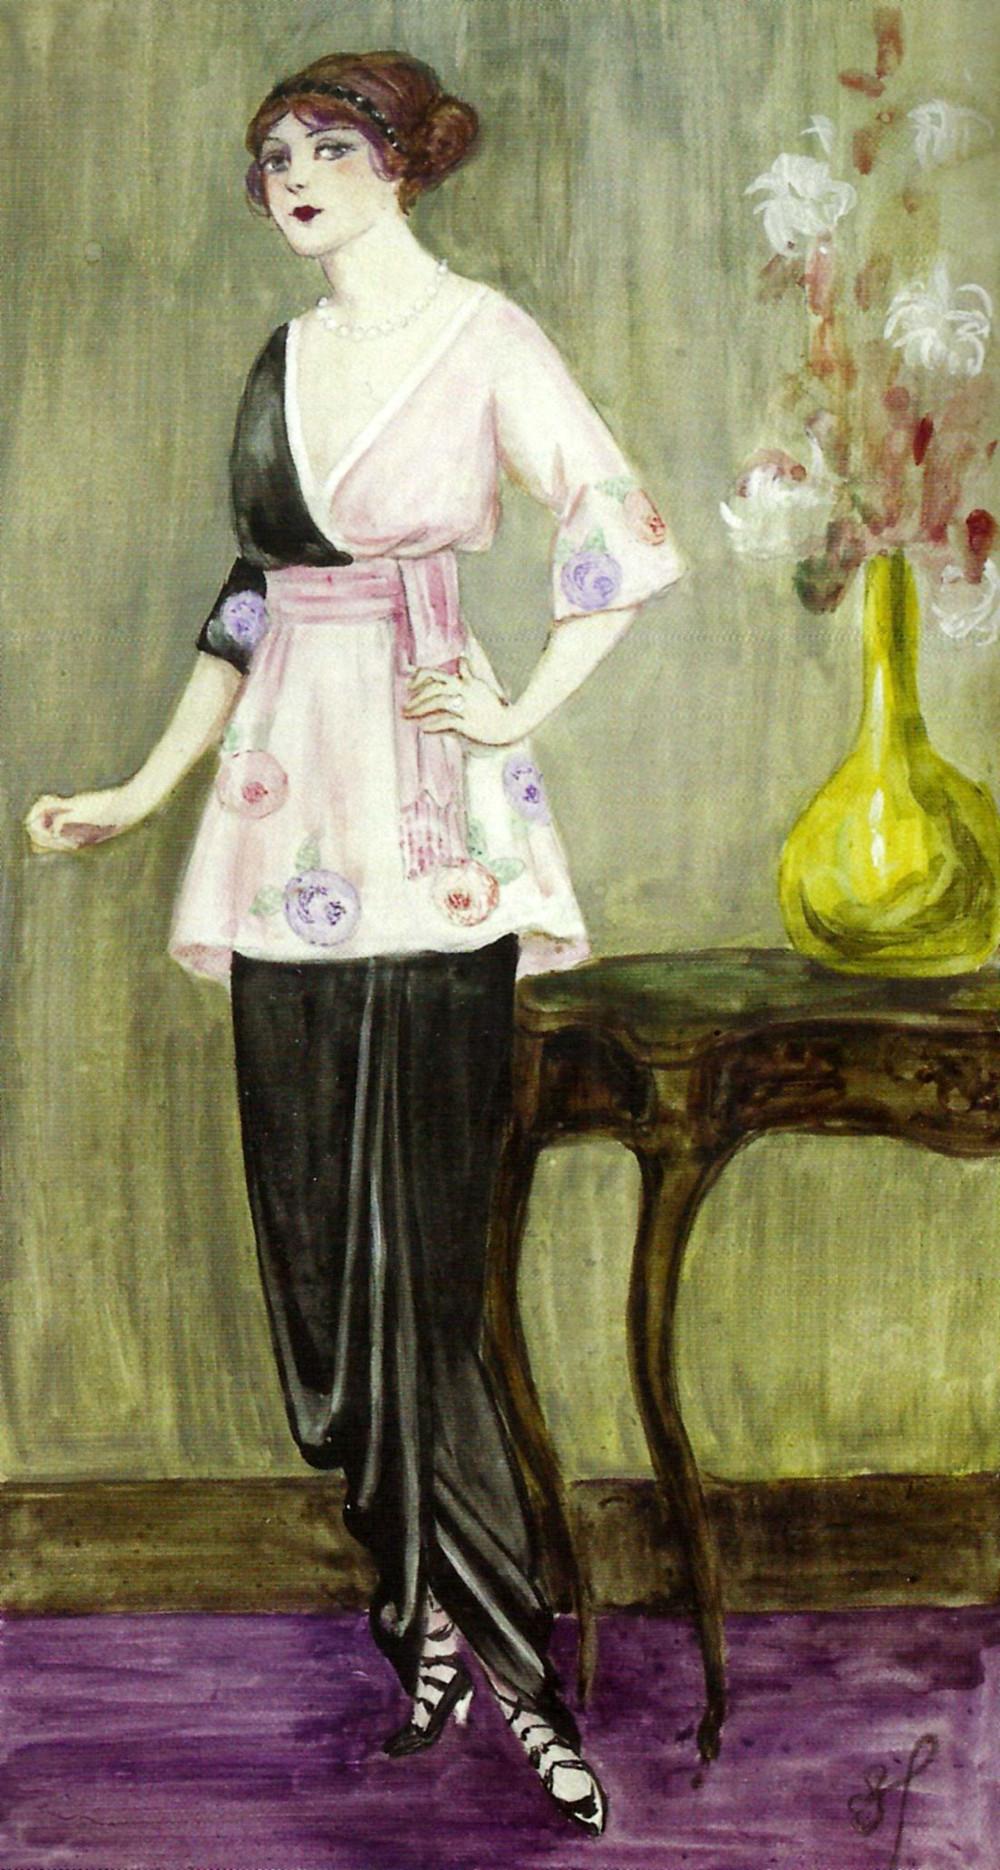 Handley-Seymour's adaptation of Poiret's Sorbet.